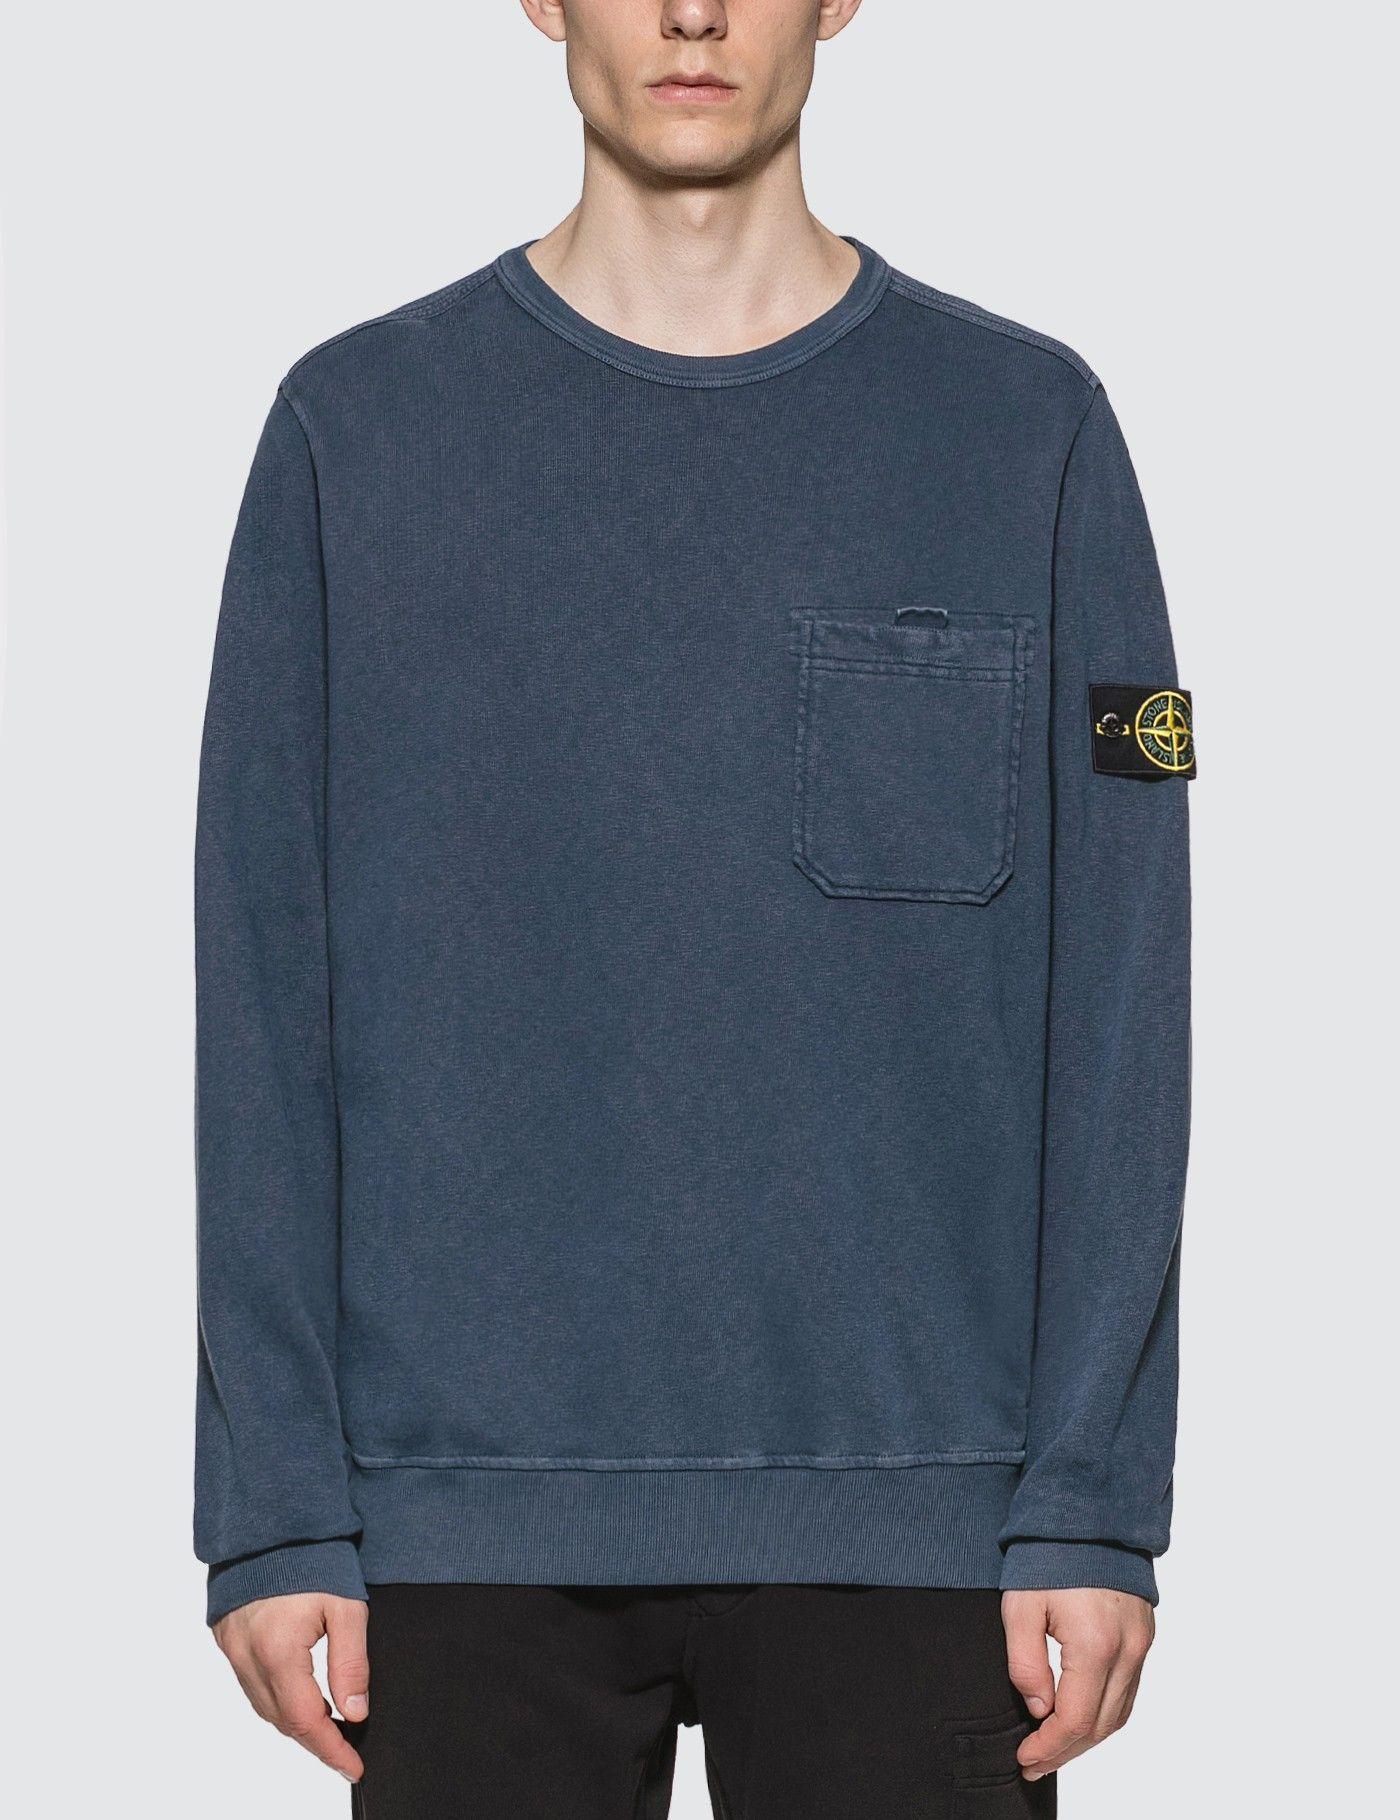 Stone Island Pocket Sweatshirt Hbx Pocket Sweatshirt Sweatshirts Long Sleeve Tshirt Men